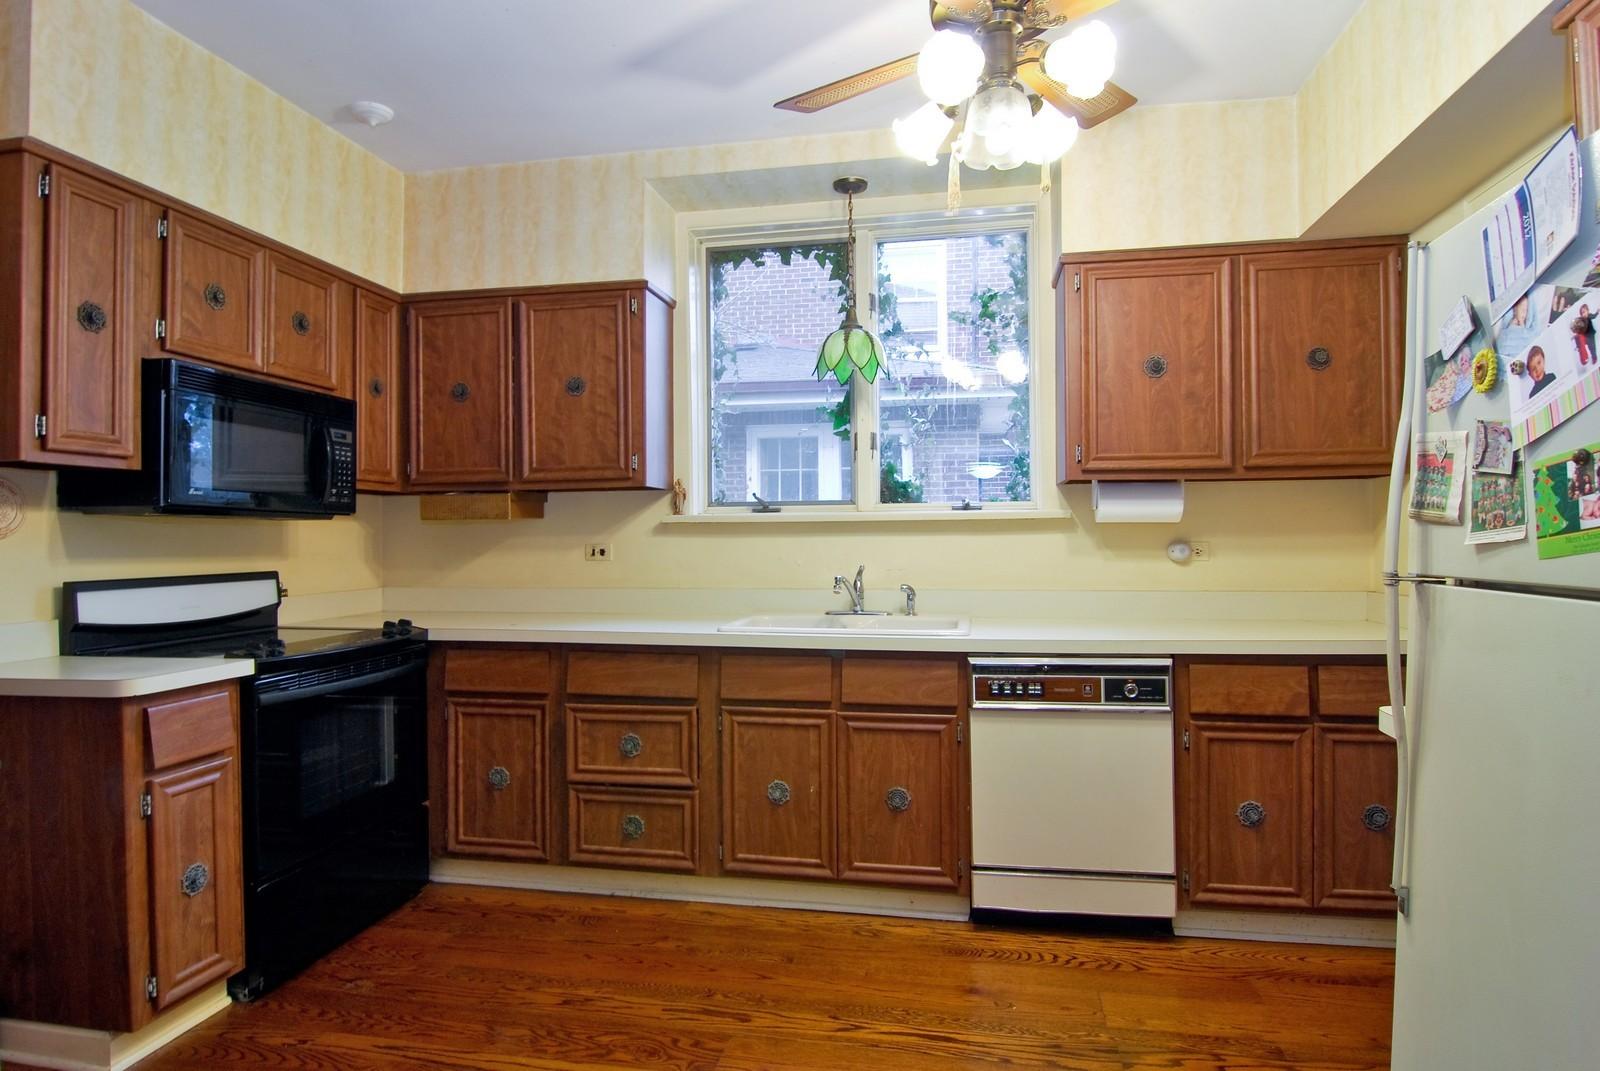 Real Estate Photography - 285 S York, Elmhurst, IL, 60126 - Kitchen